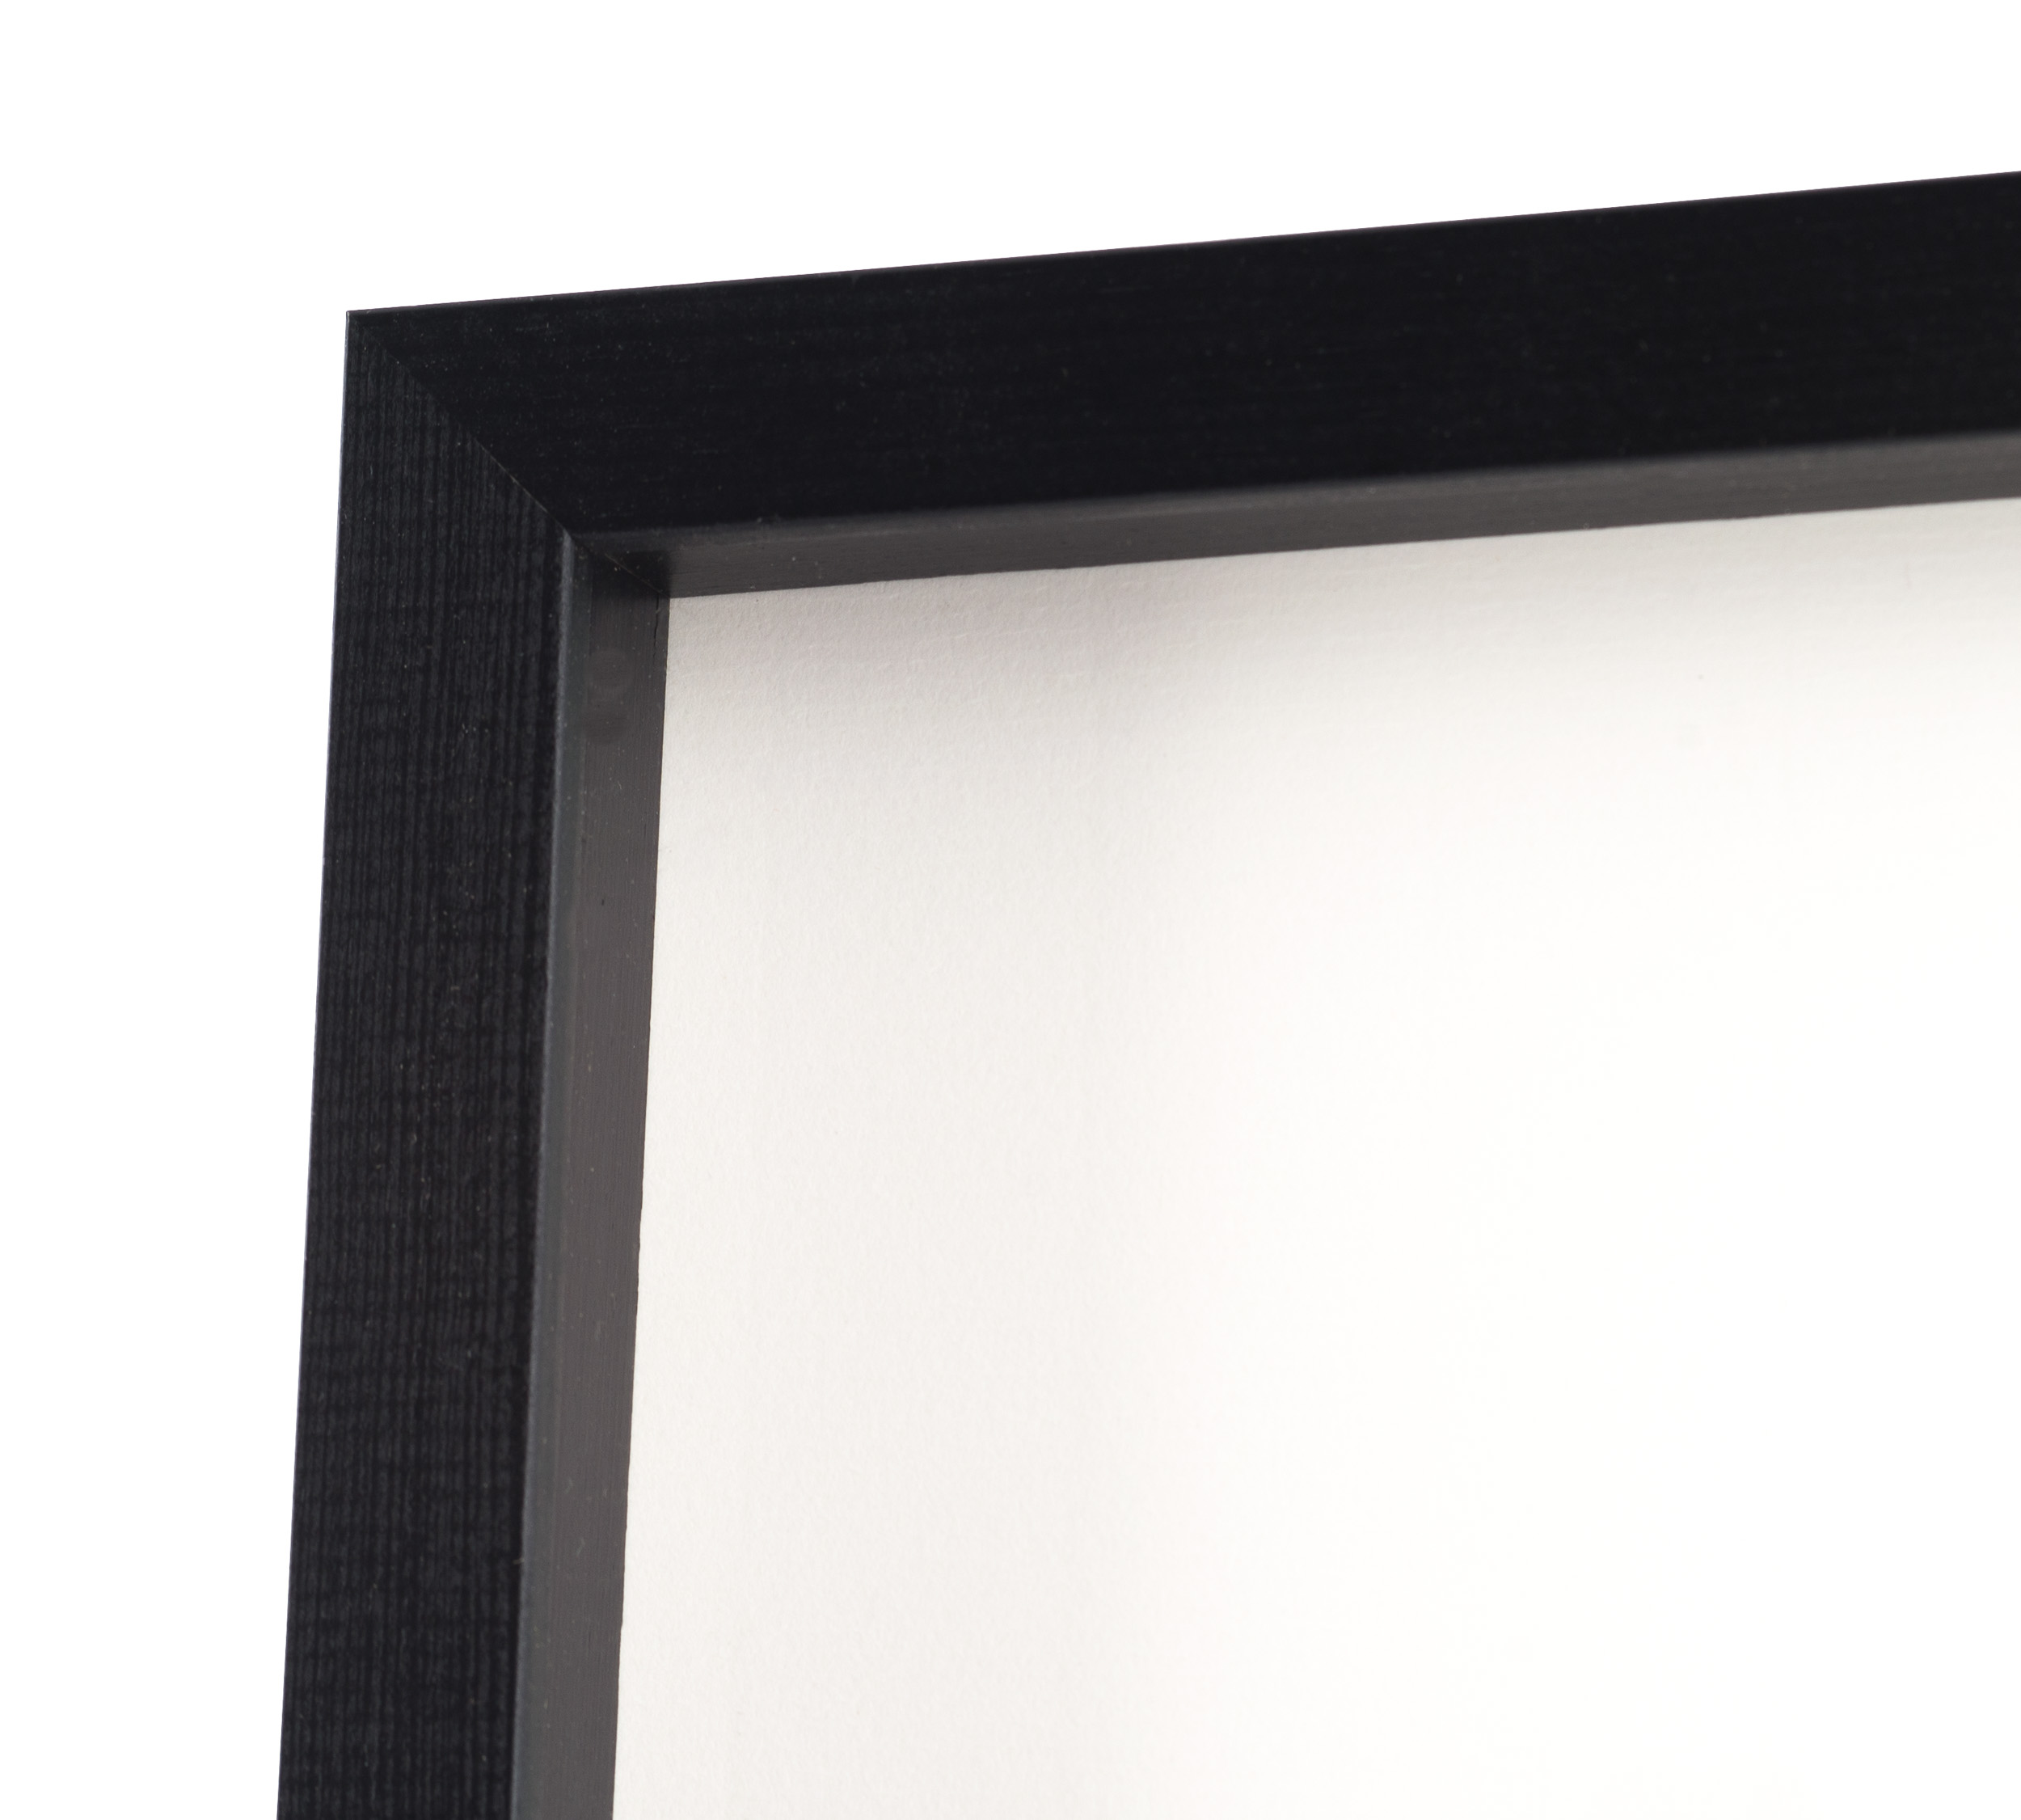 tavelram amanda box svart 70x100 cm fotoramar. Black Bedroom Furniture Sets. Home Design Ideas